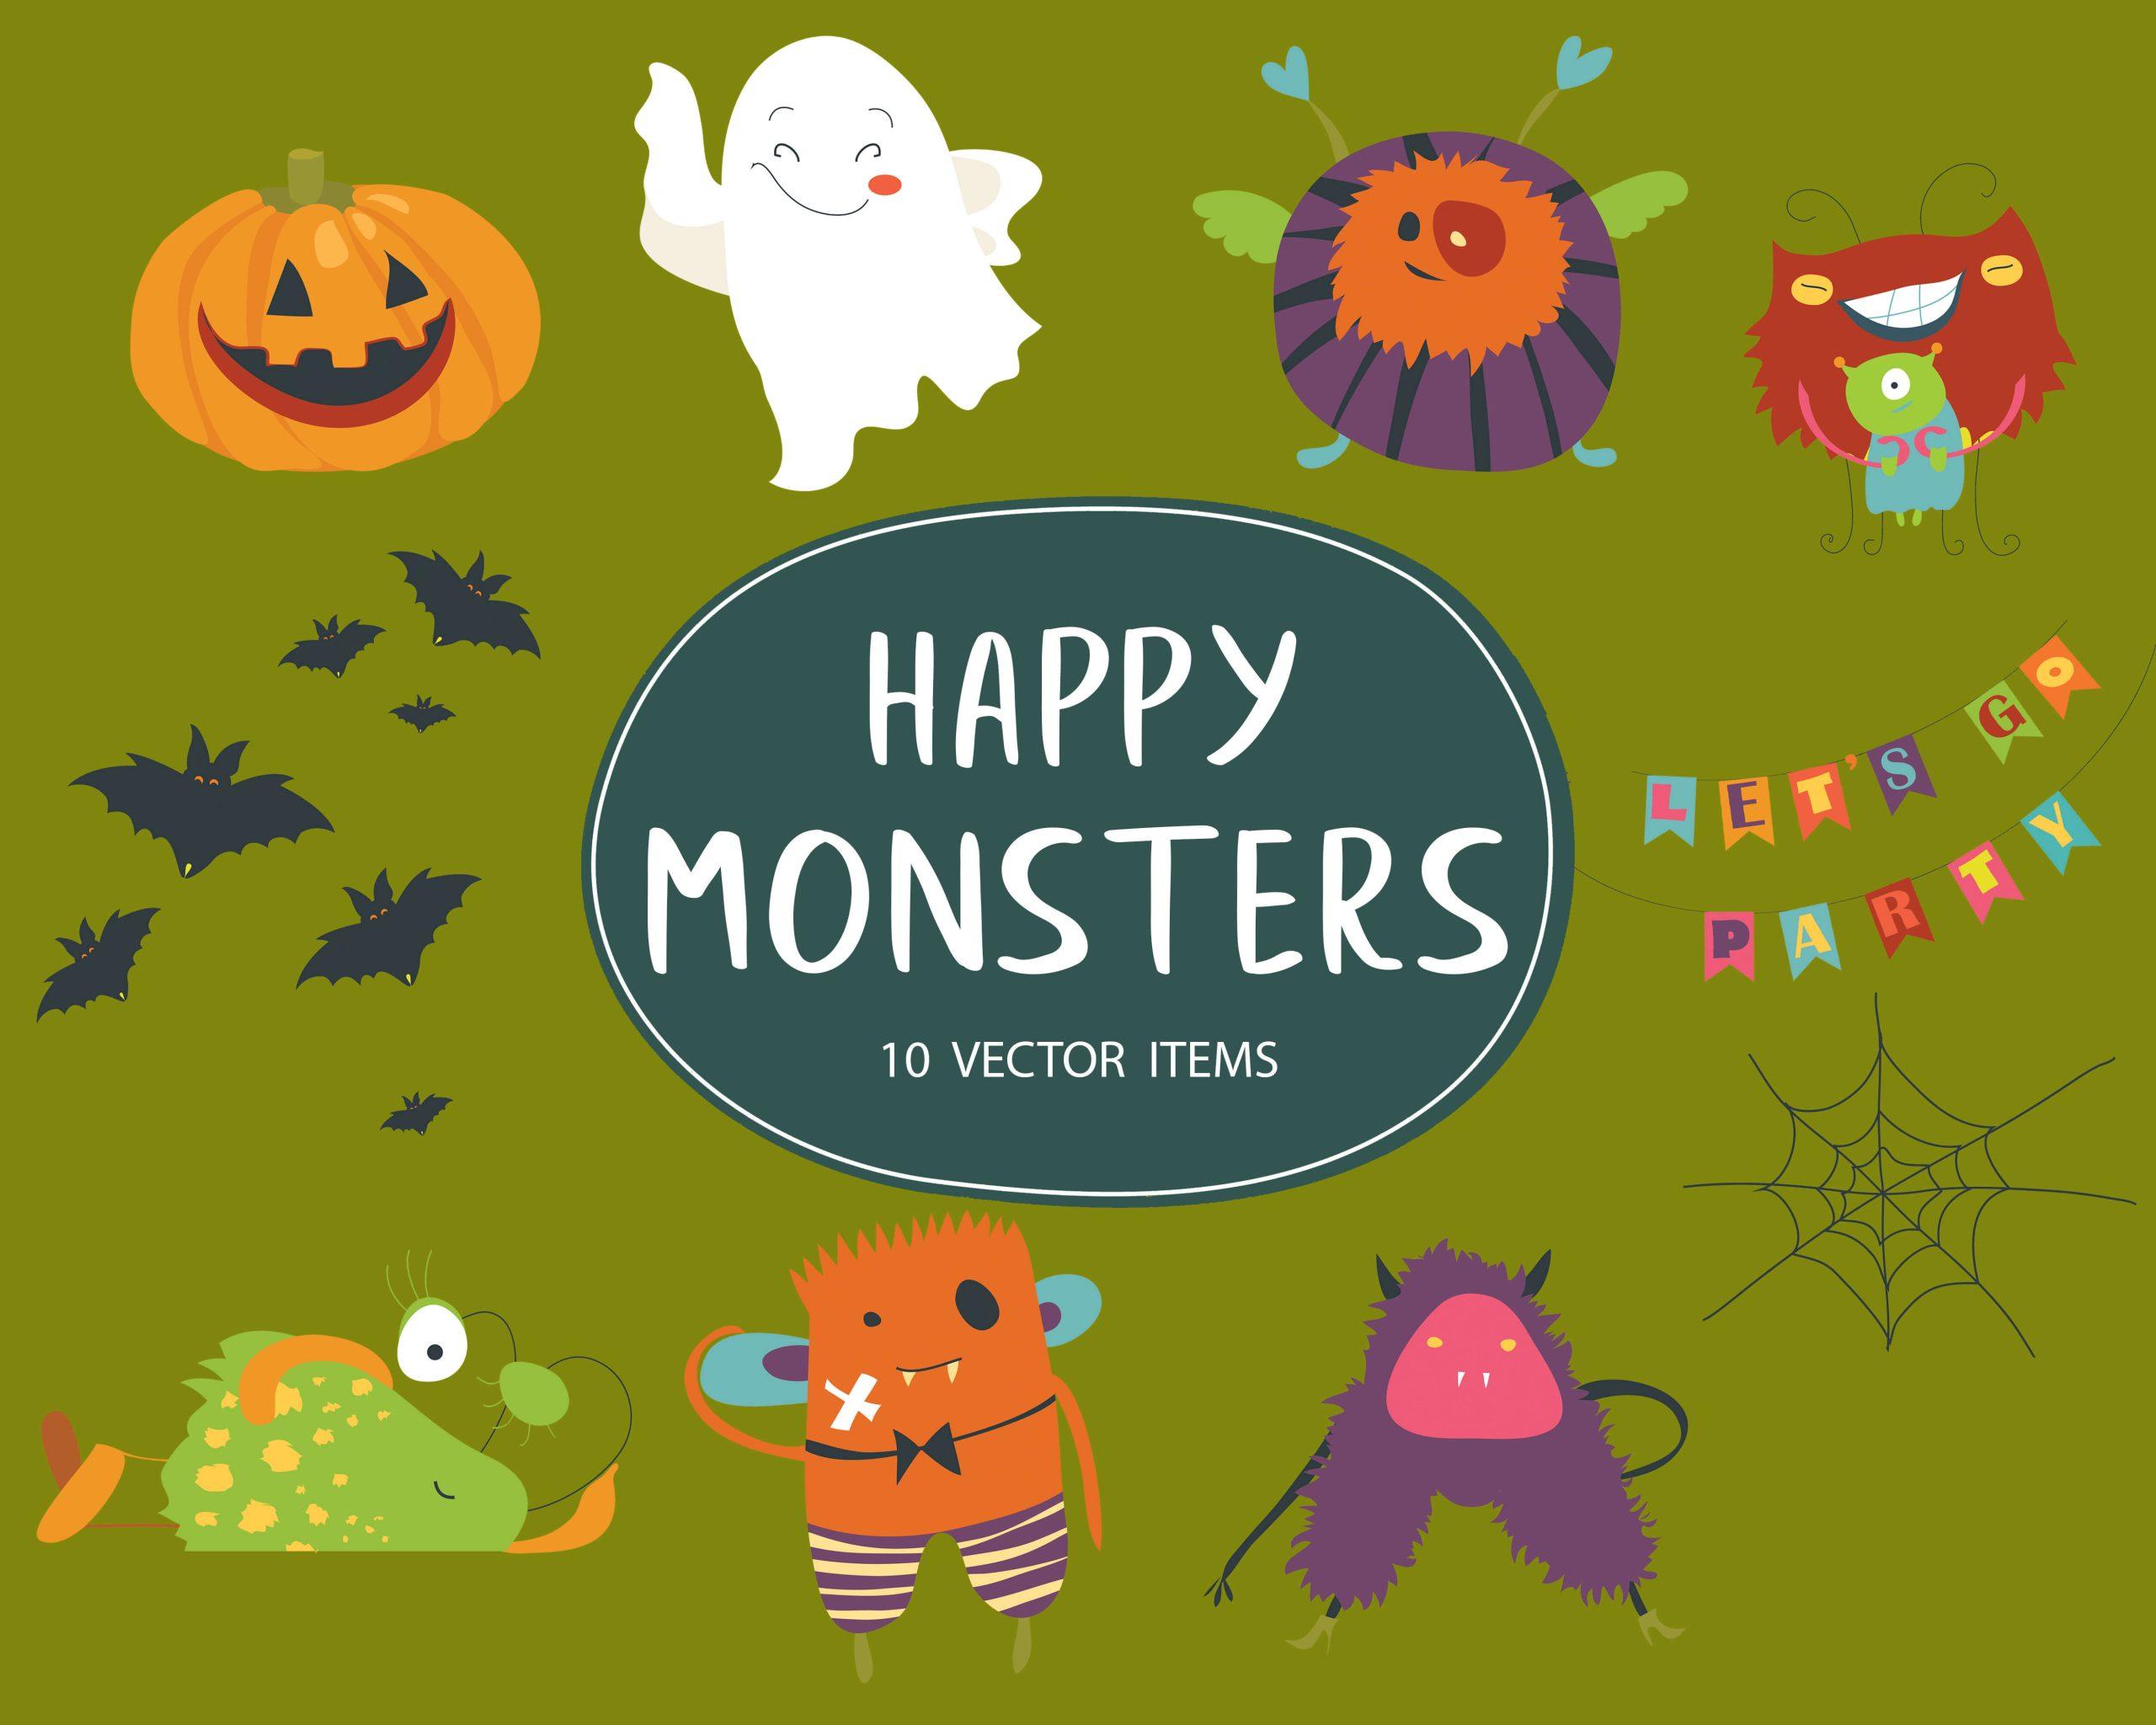 10 Happy Monsters Vector Items